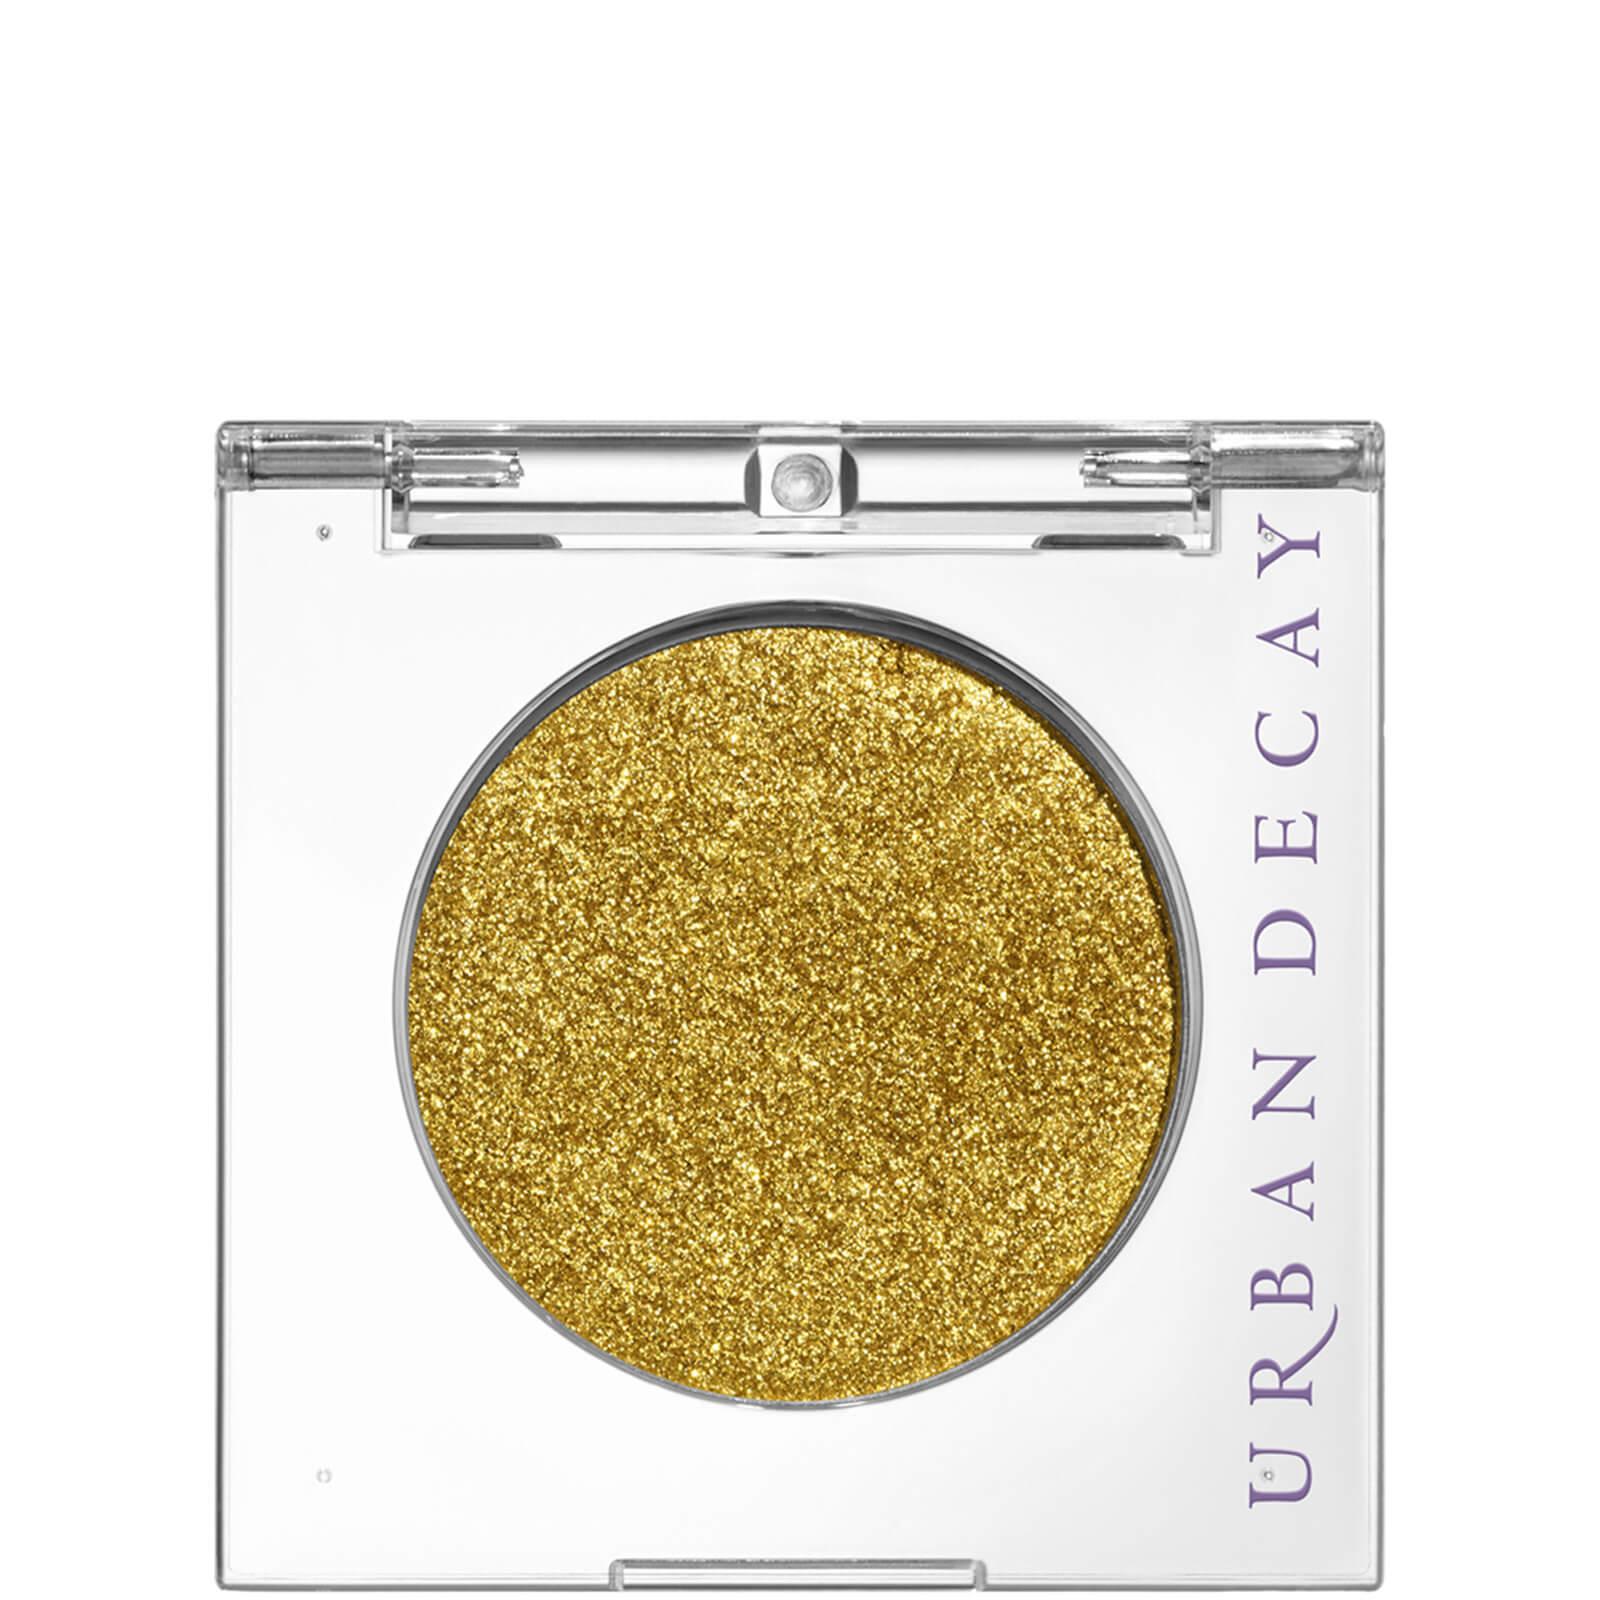 Купить Urban Decay 24/7 Eyeshadow Mono Moondust (Various Shades) - Overdraft